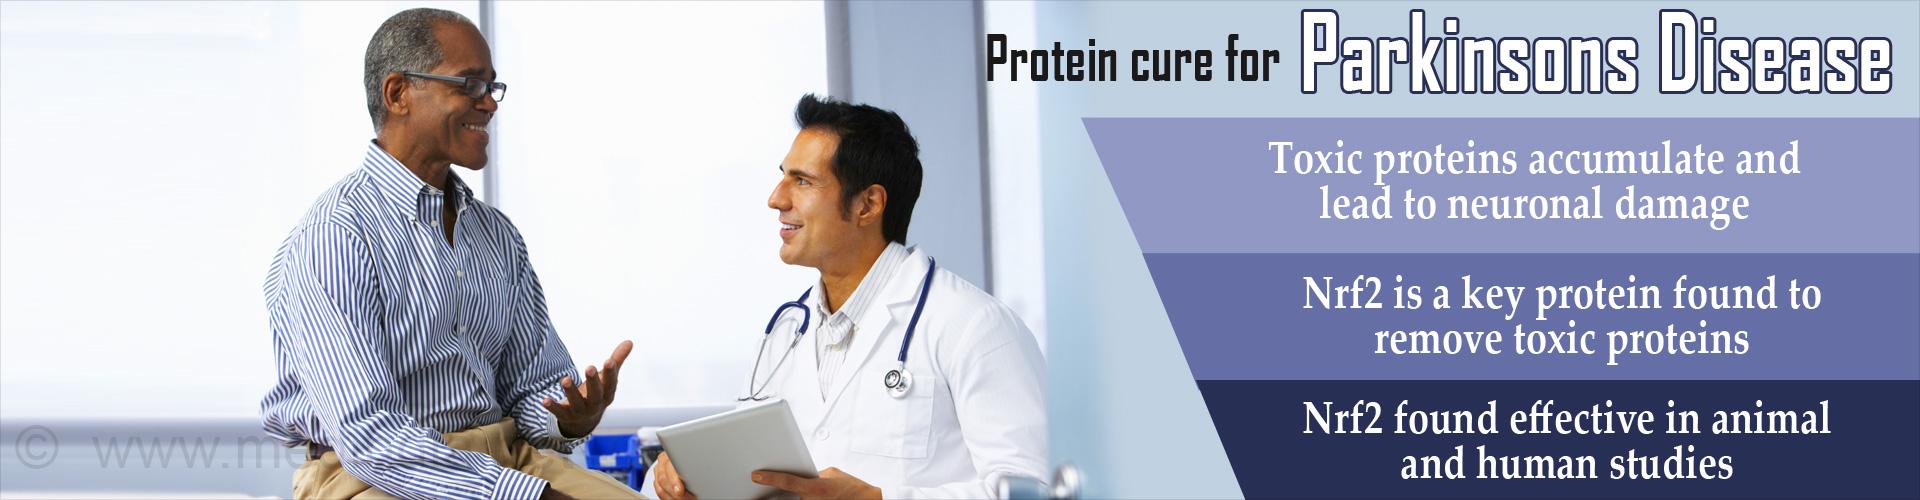 Protein Found  Effective Against Parkinson's Disease